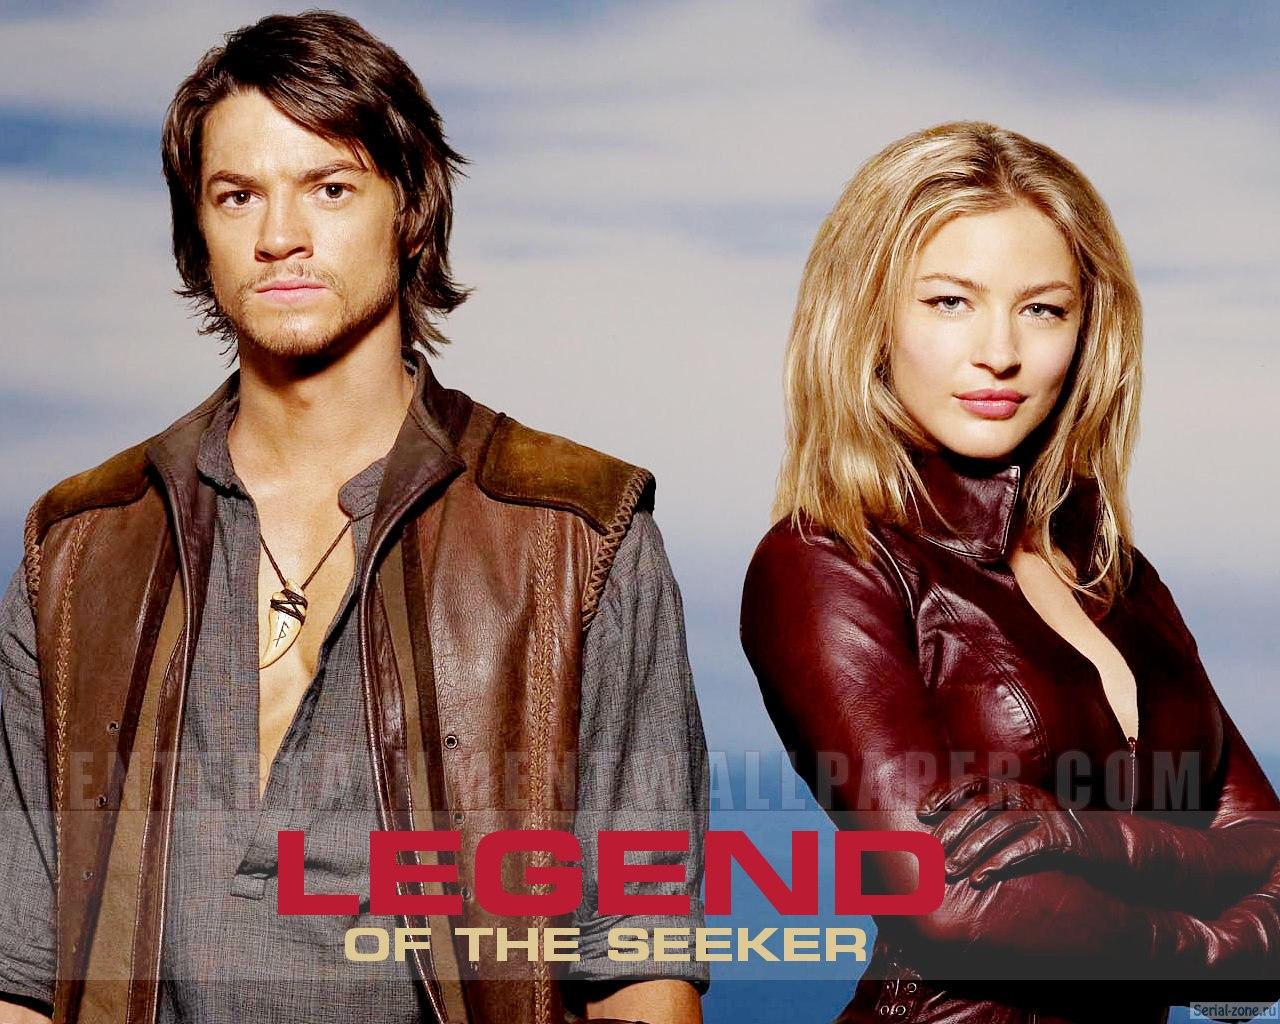 http://serial-zone.ru/inc/goods_wallpapers/legend_of_the_seeker/legend_of_the_seeker7.jpg